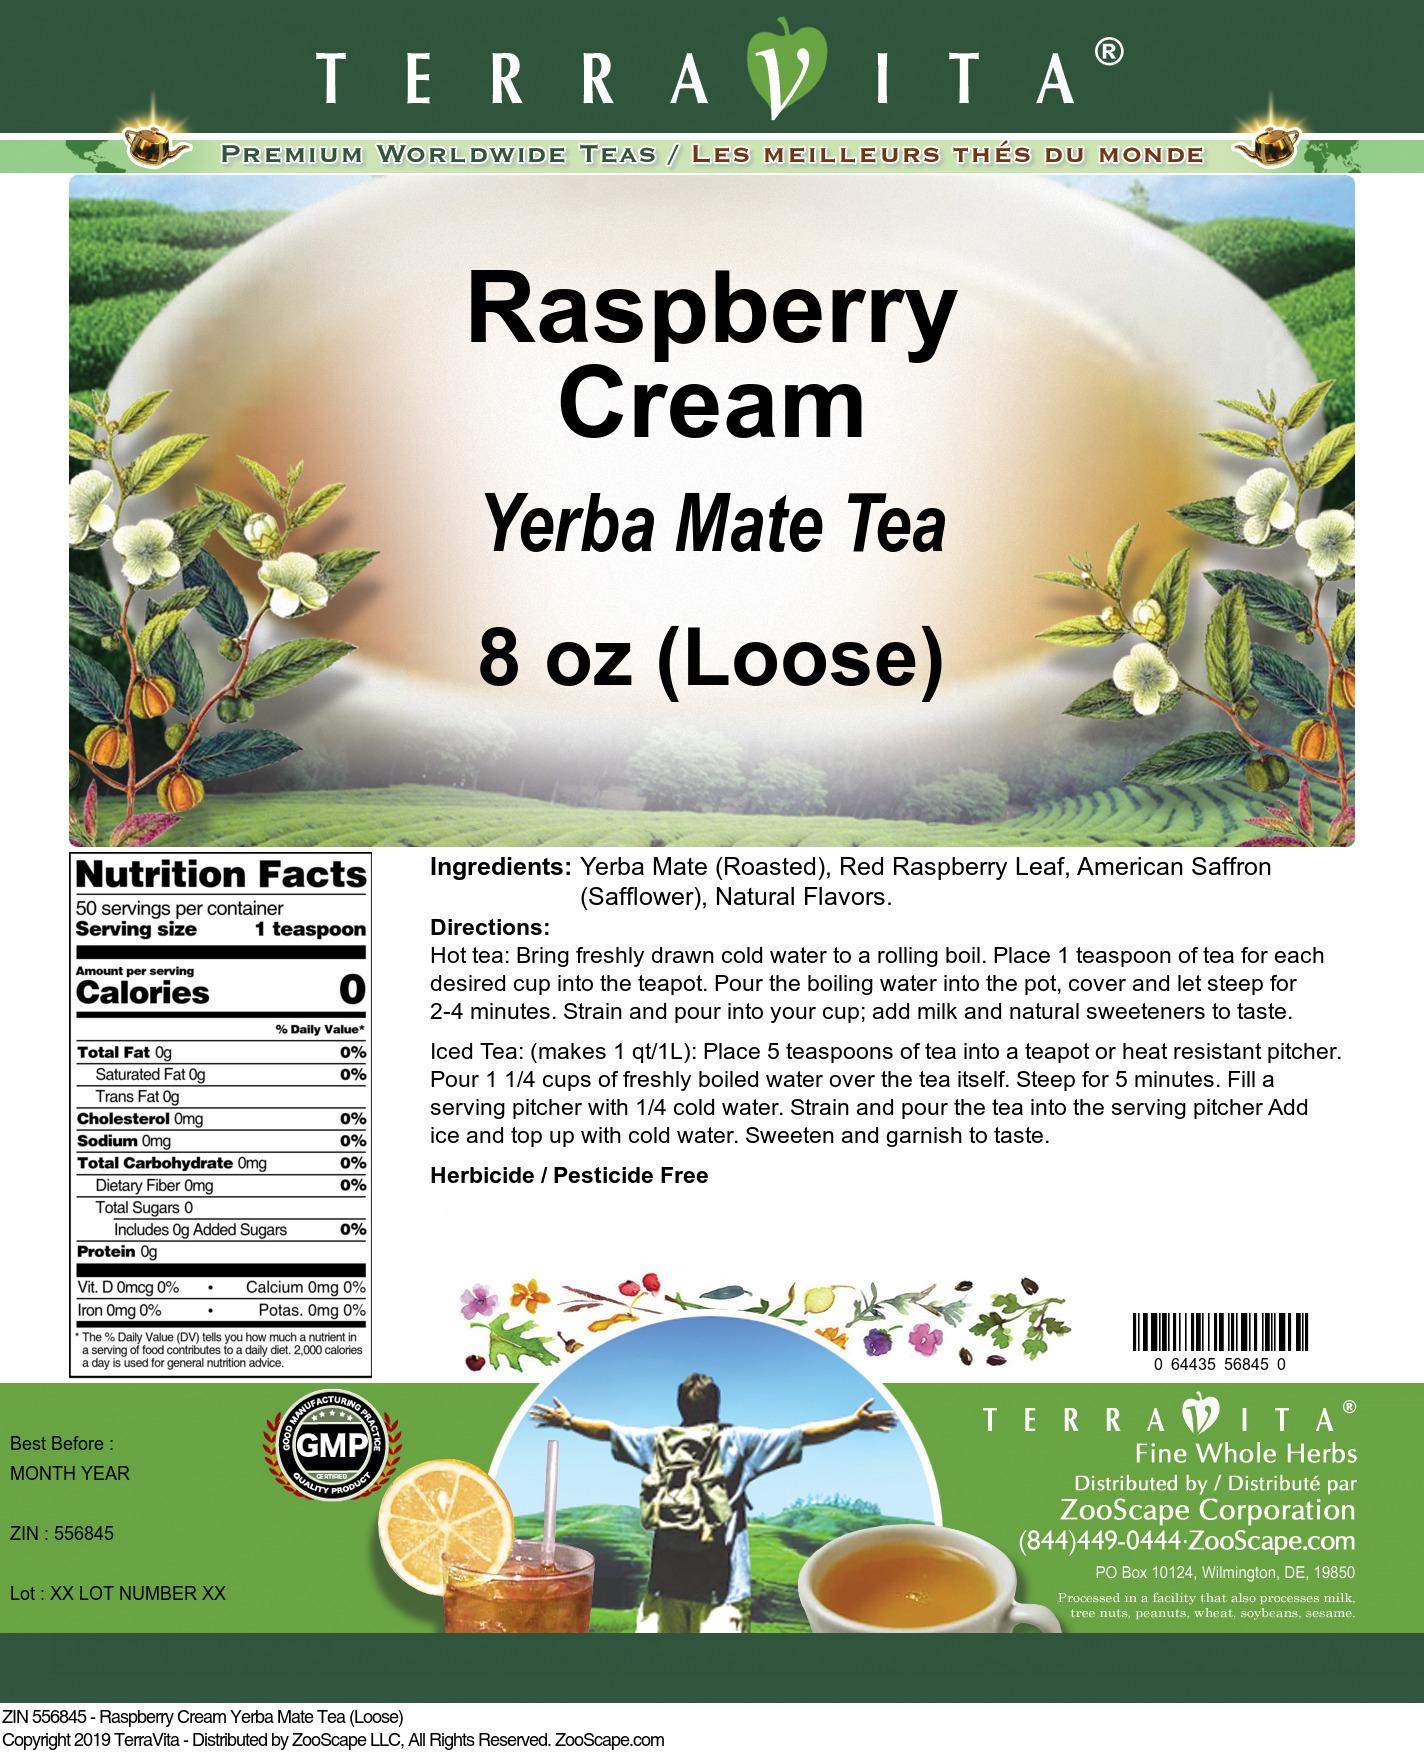 Raspberry Cream Yerba Mate Tea (Loose)